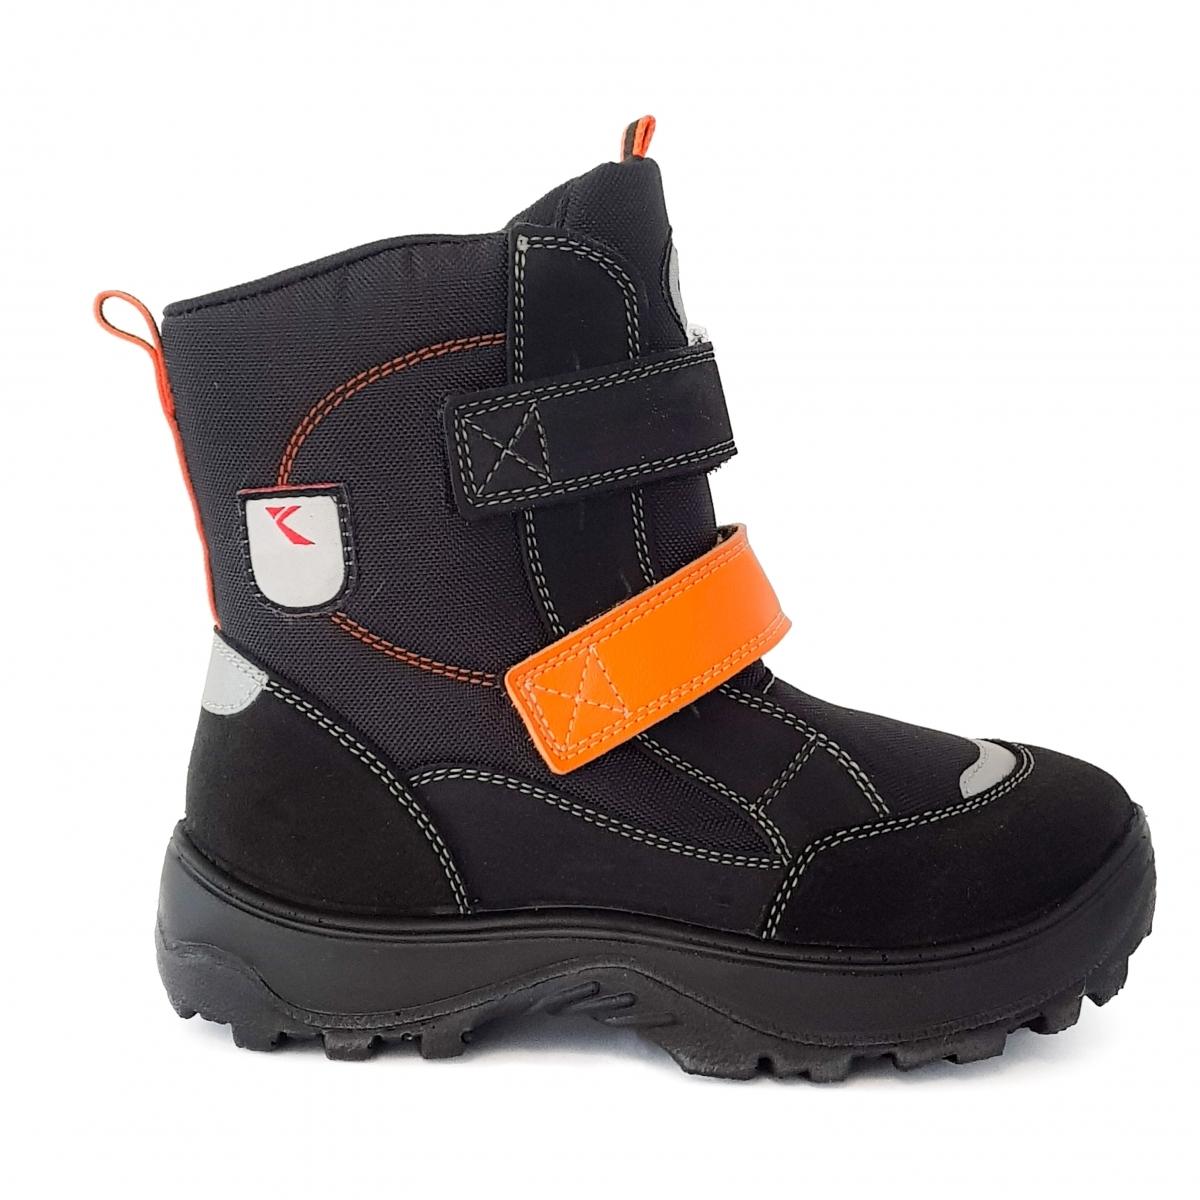 Ghete impermeabile copii blana GT tex 93311 negru orange 20-25